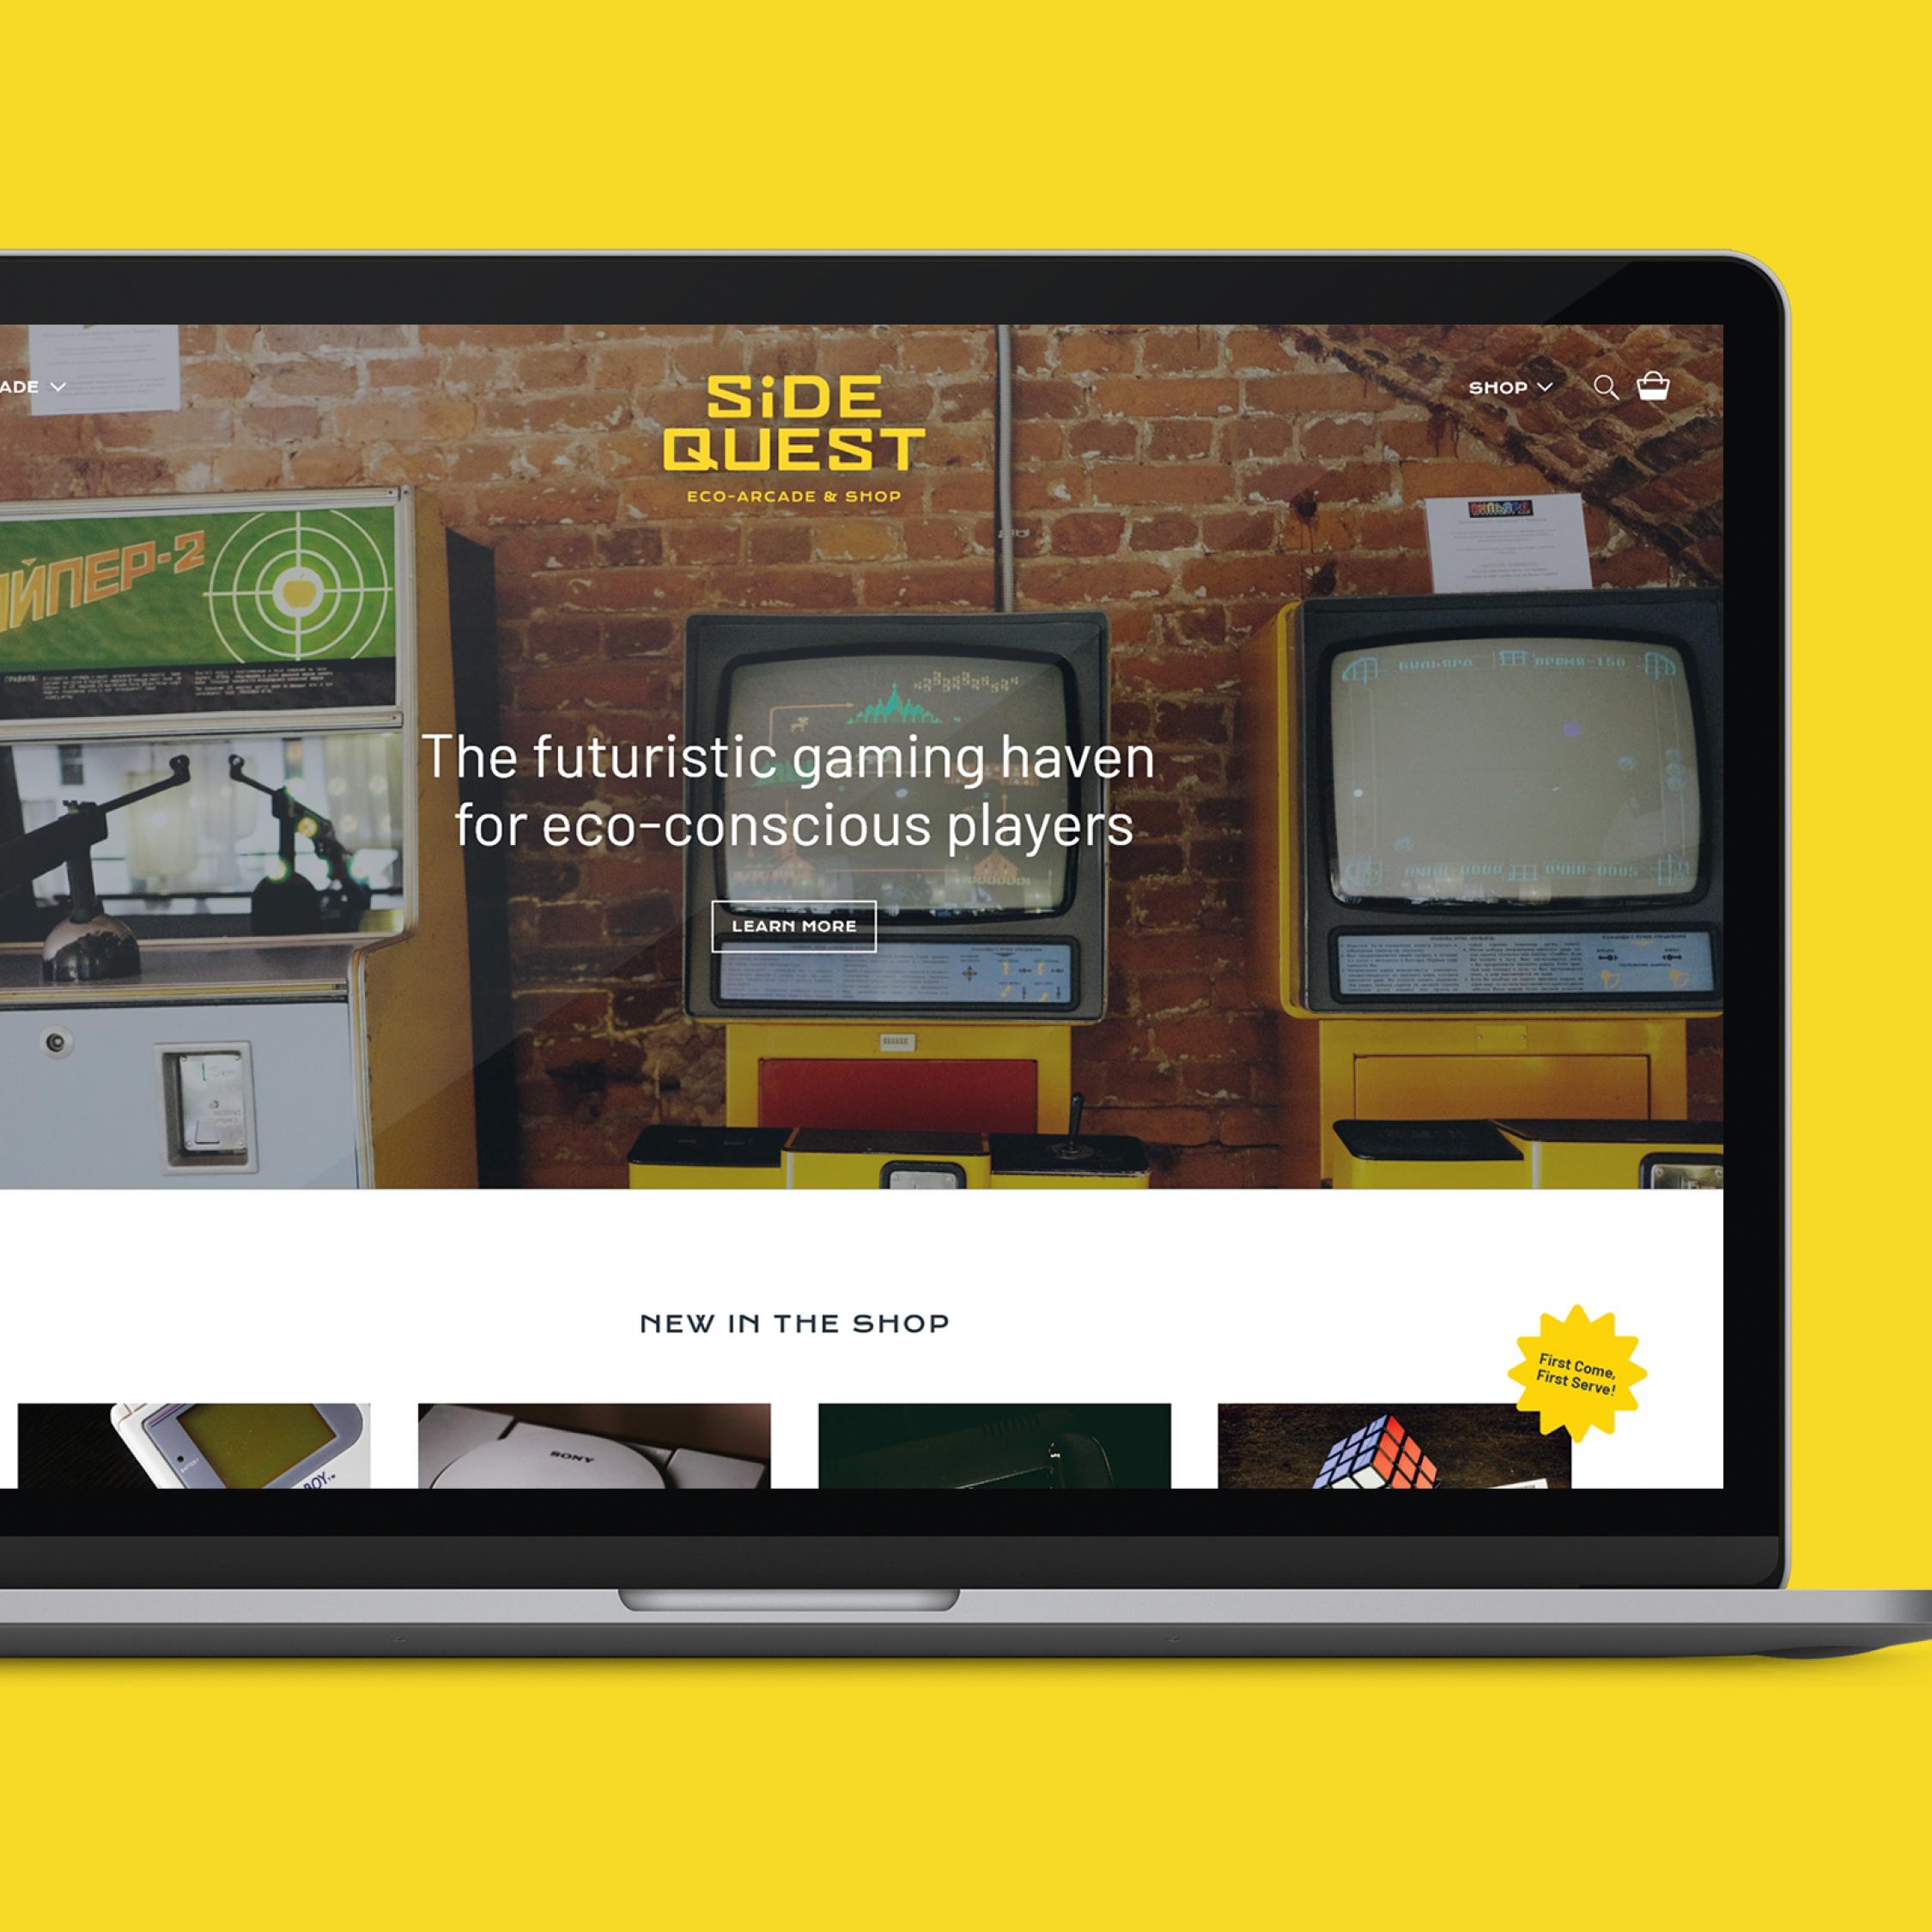 Desktop view of Side Quest's Shopify website